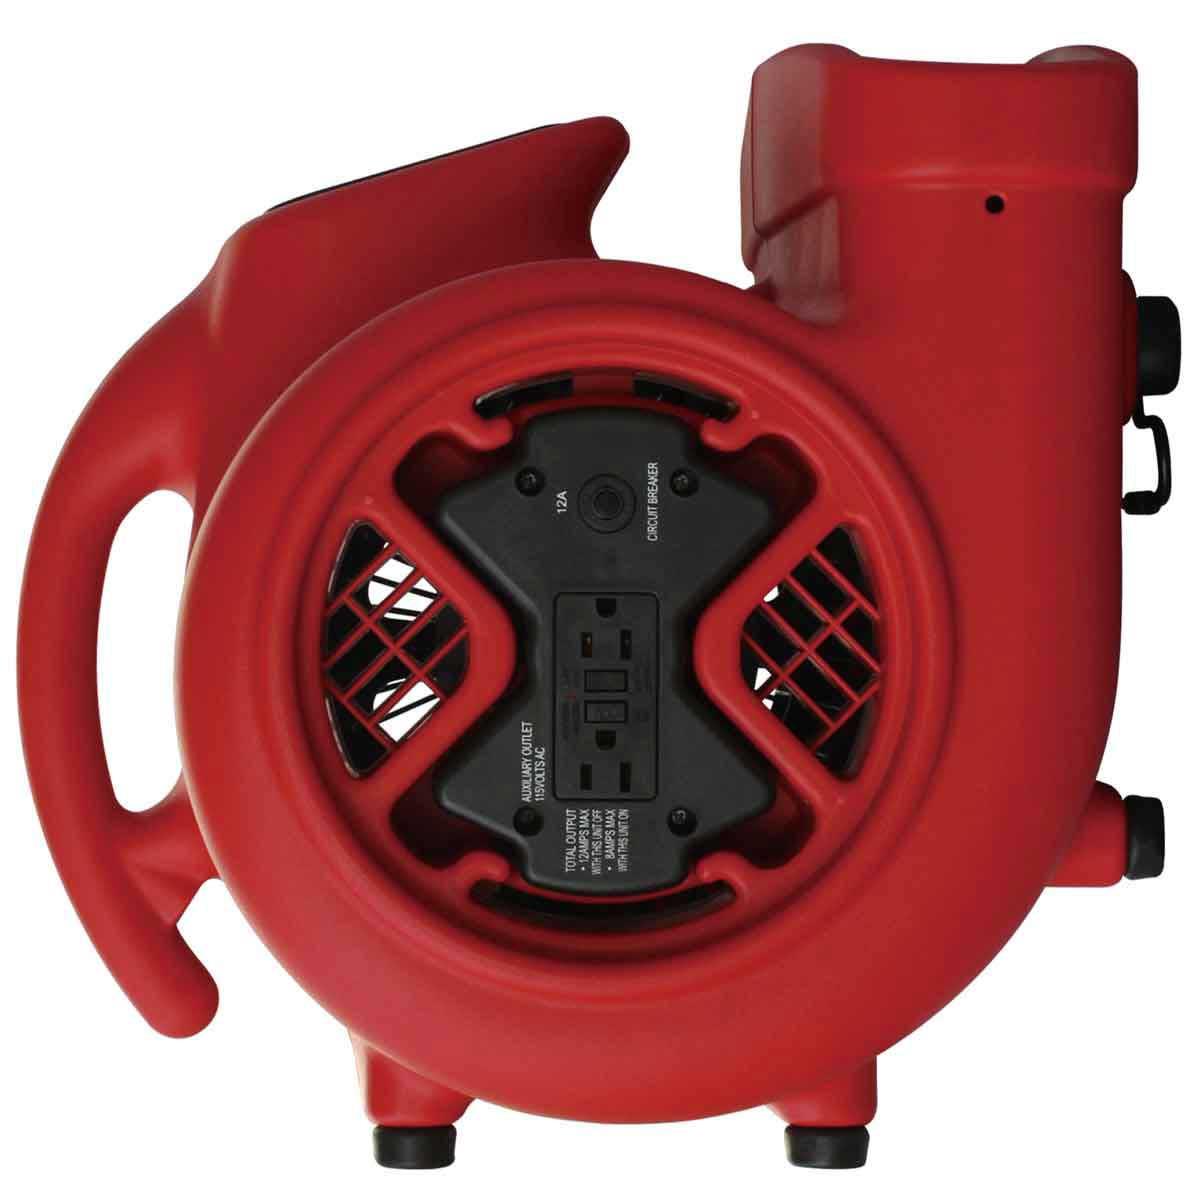 Hawk Air Mover ventilator back